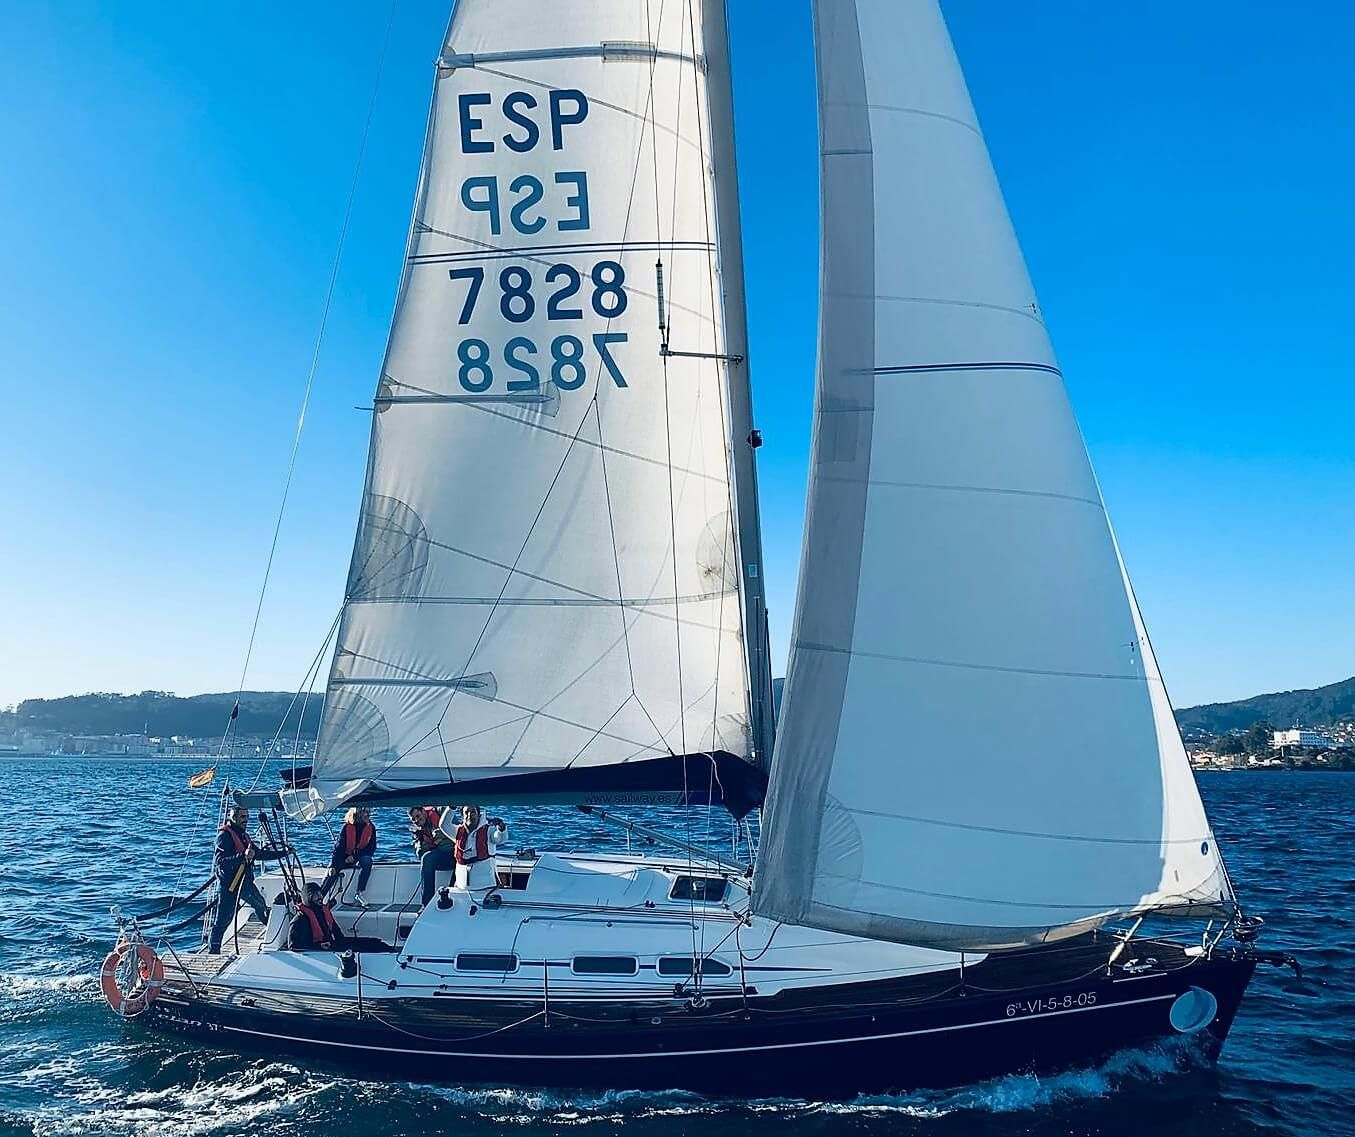 Sailway_15Aniversario_Vigo_Galicia_Turismo_Náutico